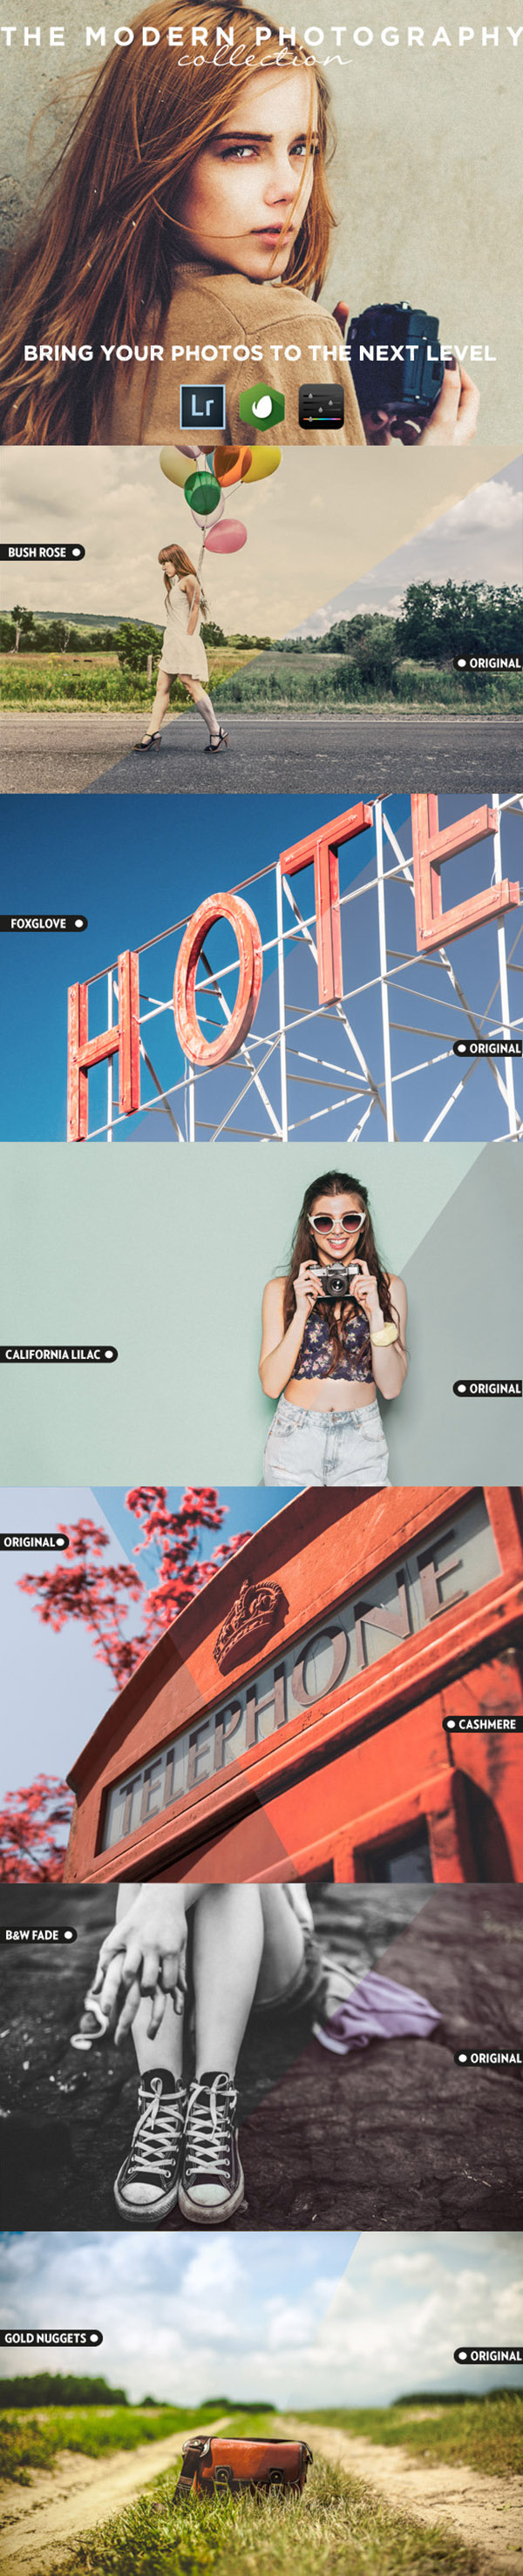 02 The Modern Photography - Lightroom presets